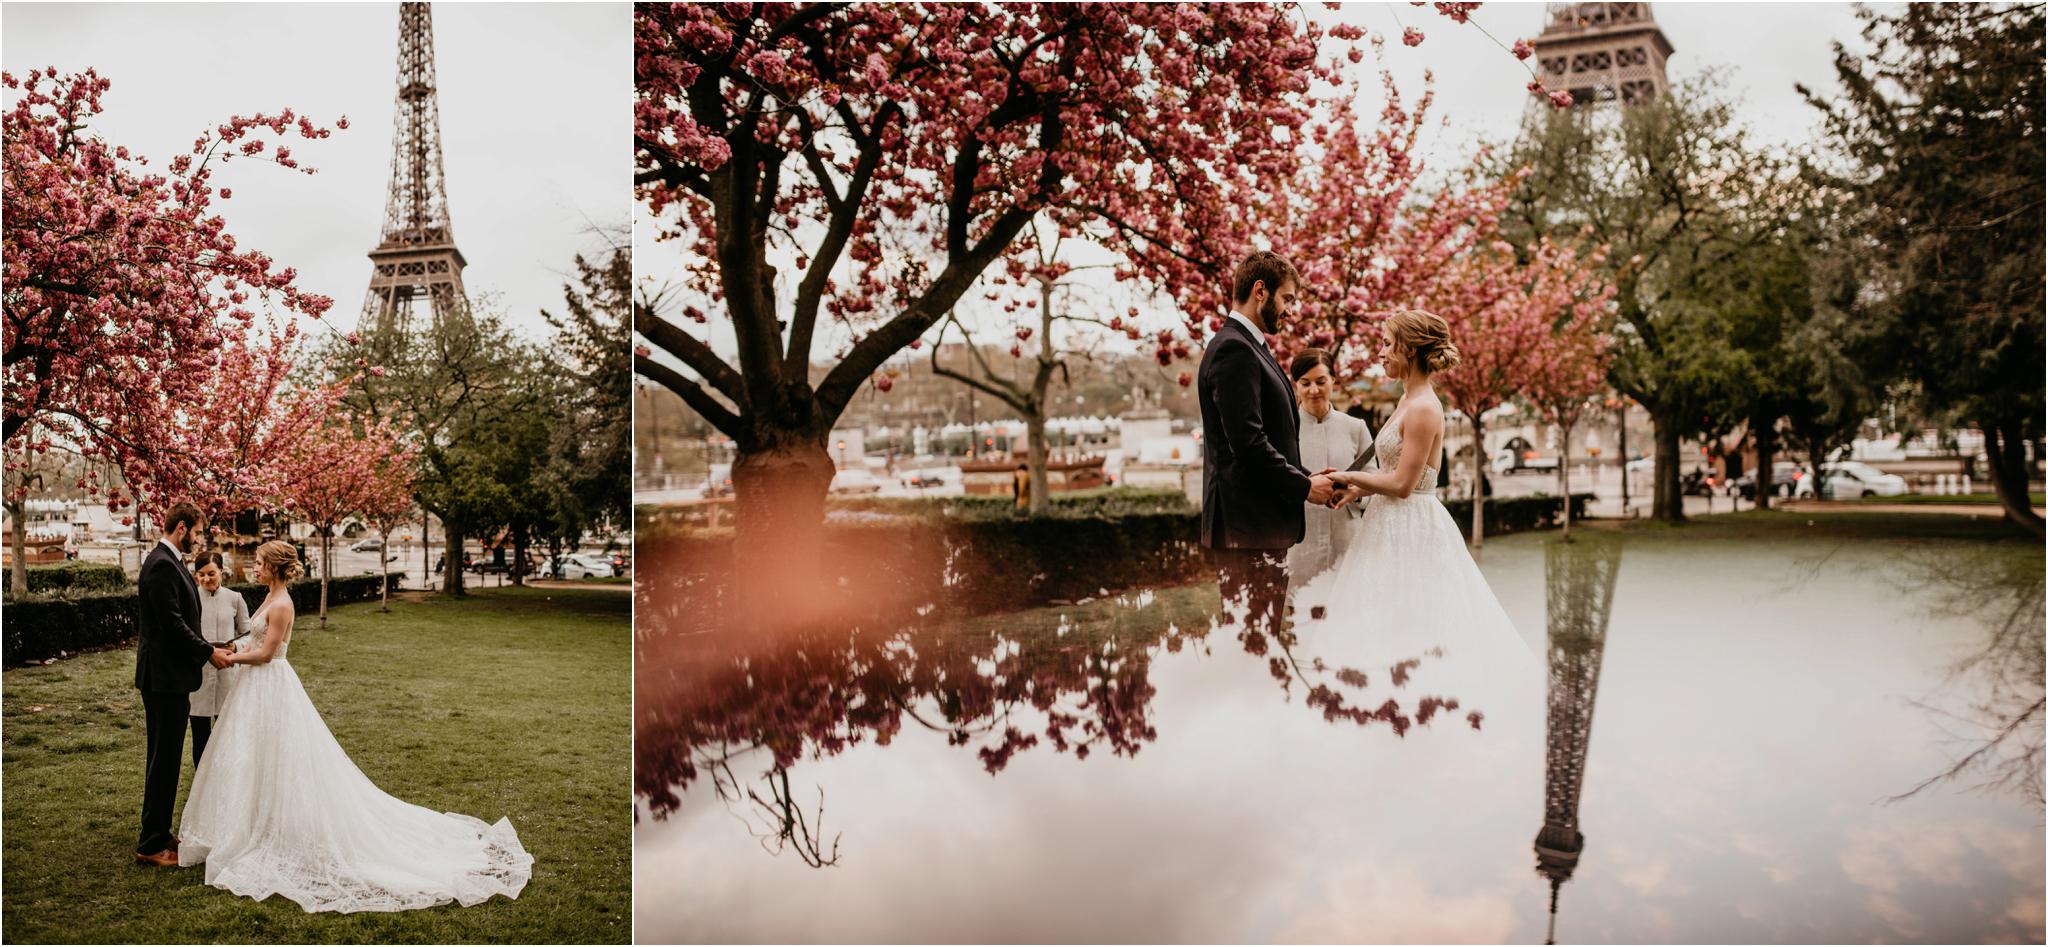 miranda-and-jared-paris-elopement-destination-wedding-photographer-029.jpg